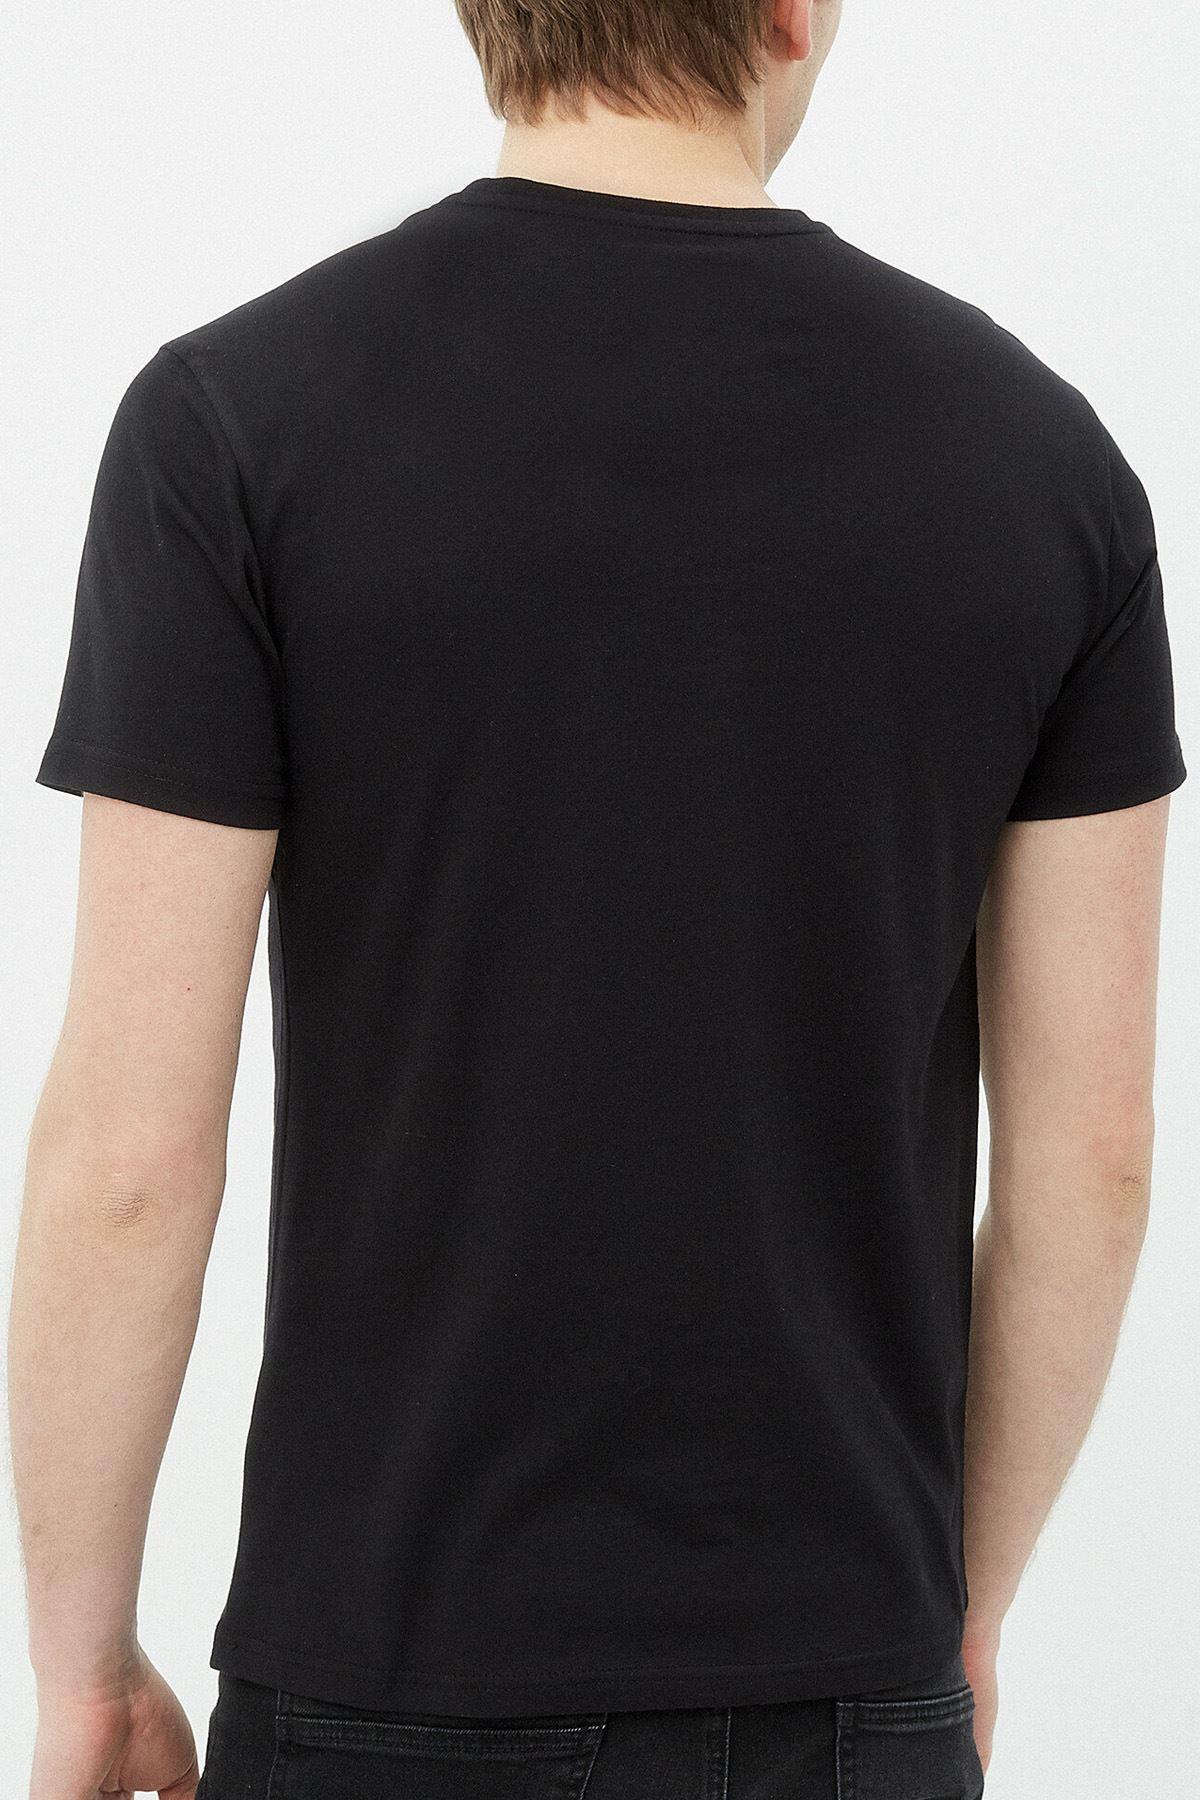 Anime Let's Jam Siyah Erkek Tshirt - Tişört